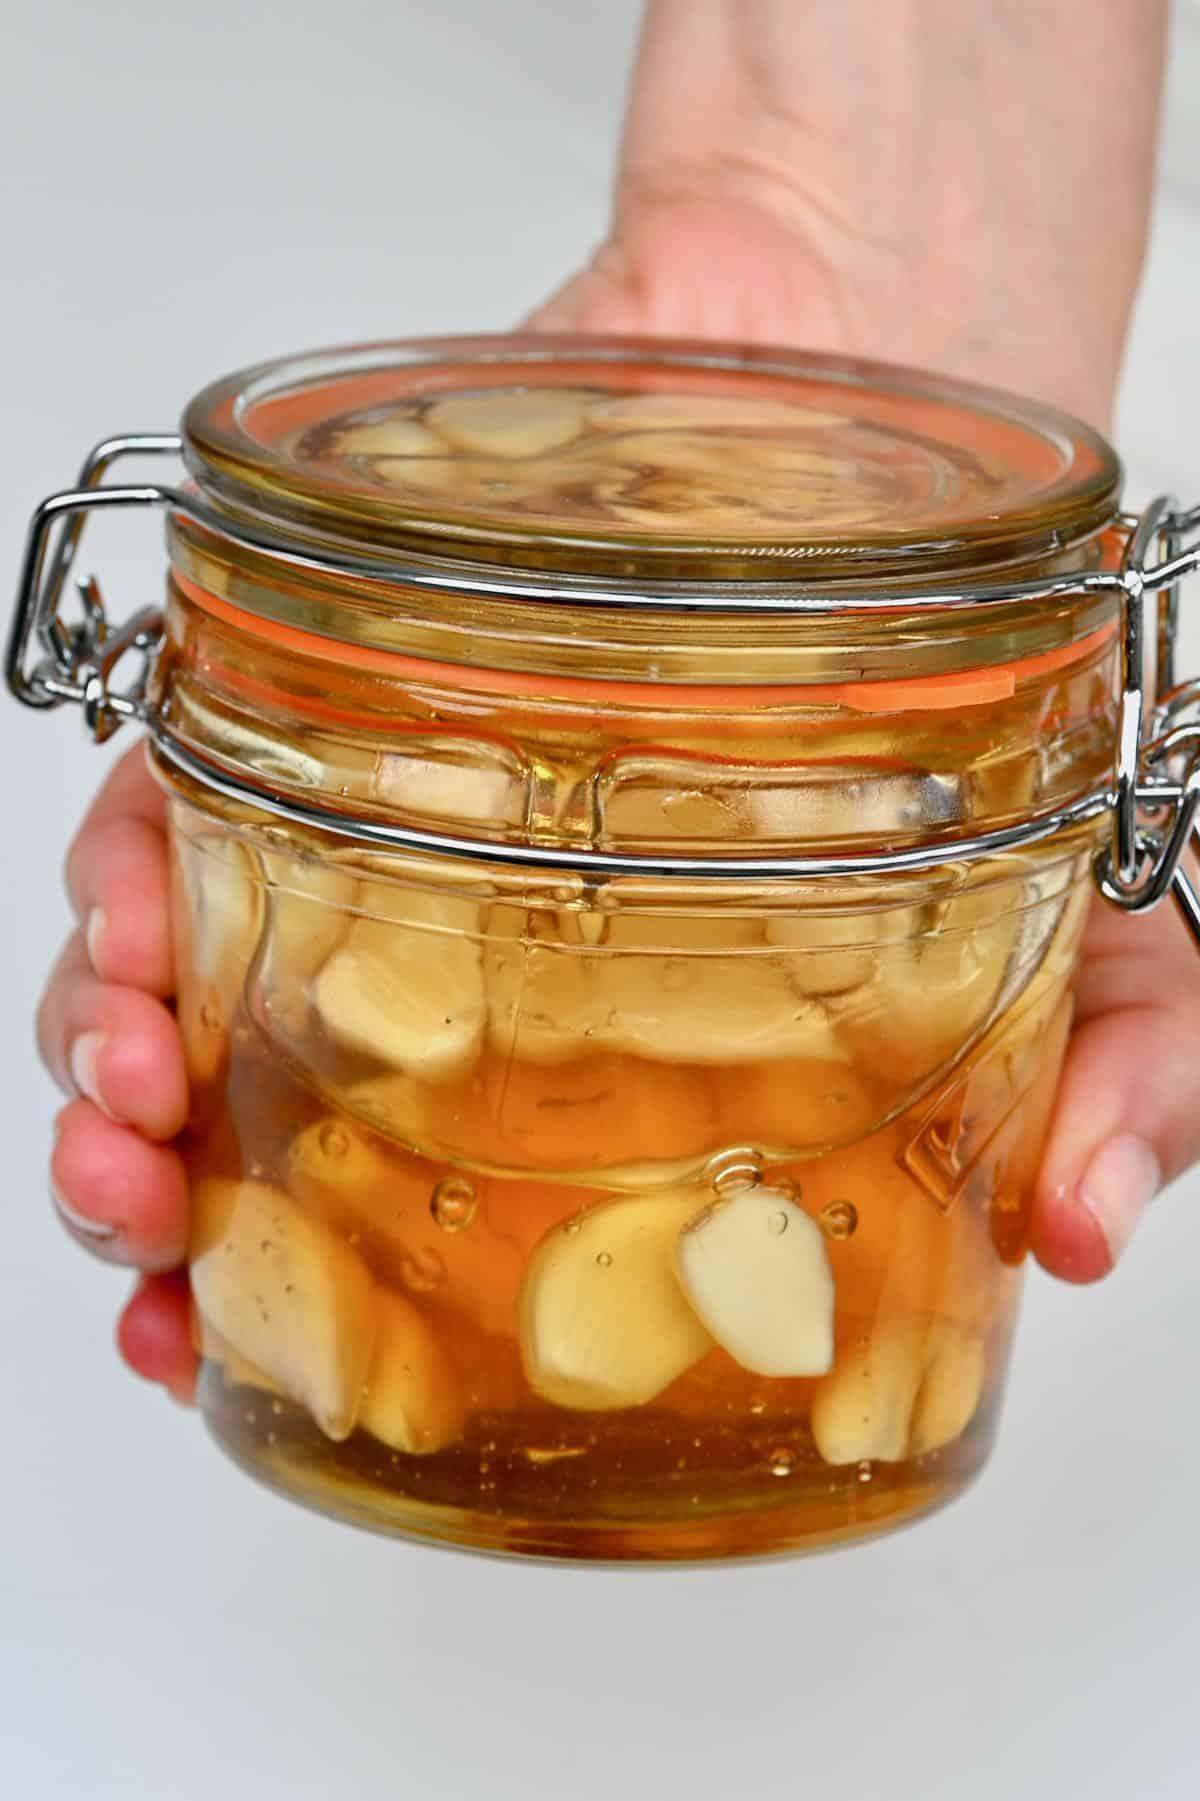 Hand holding a jar with fermented honey garlic